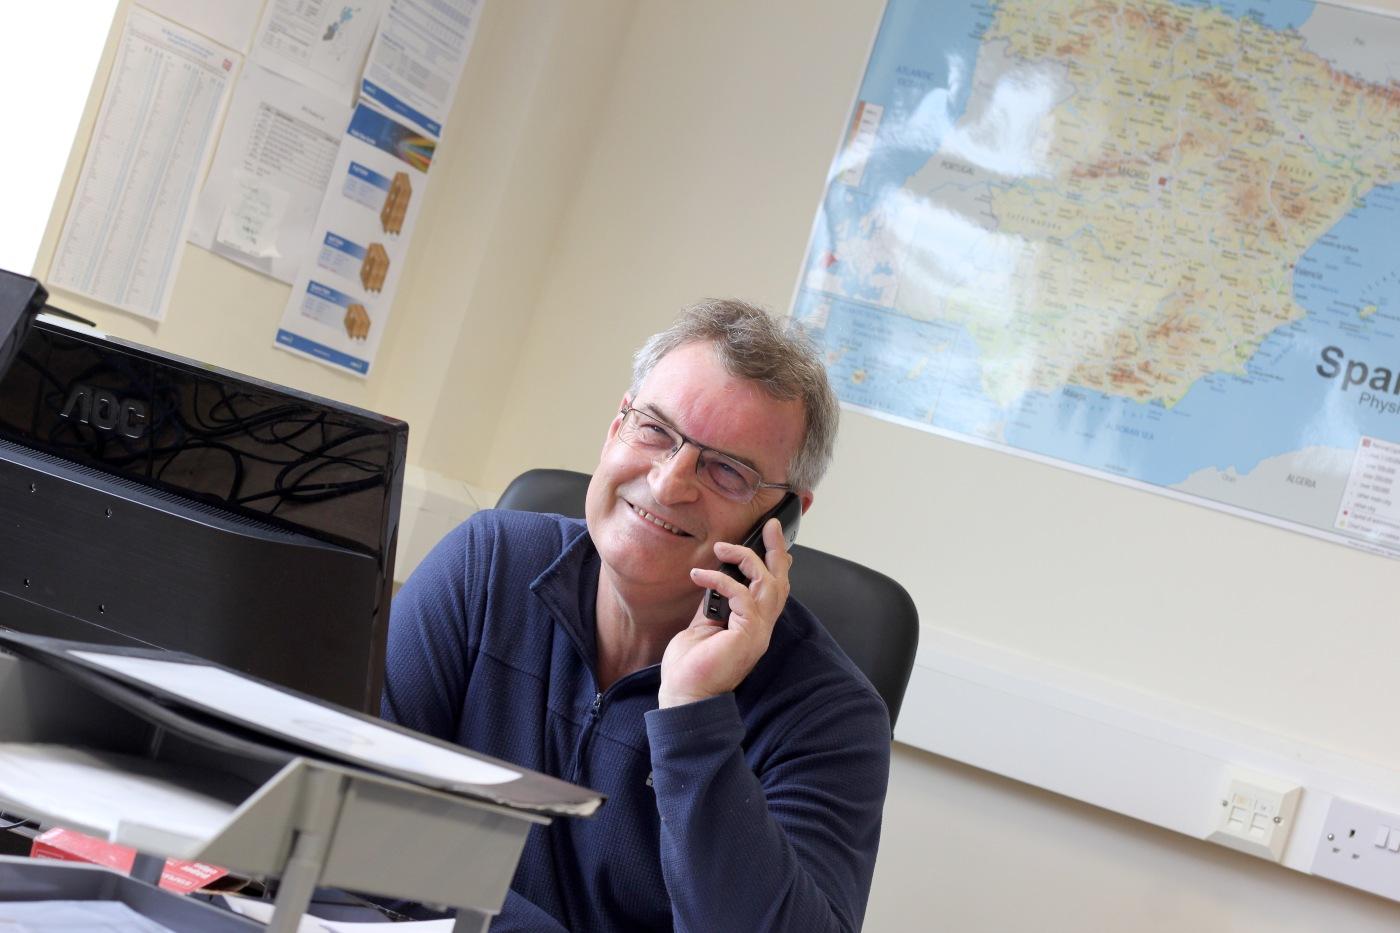 Job Vacancy ǀ Customer Services Advisor ǀ £20,000 p.a.